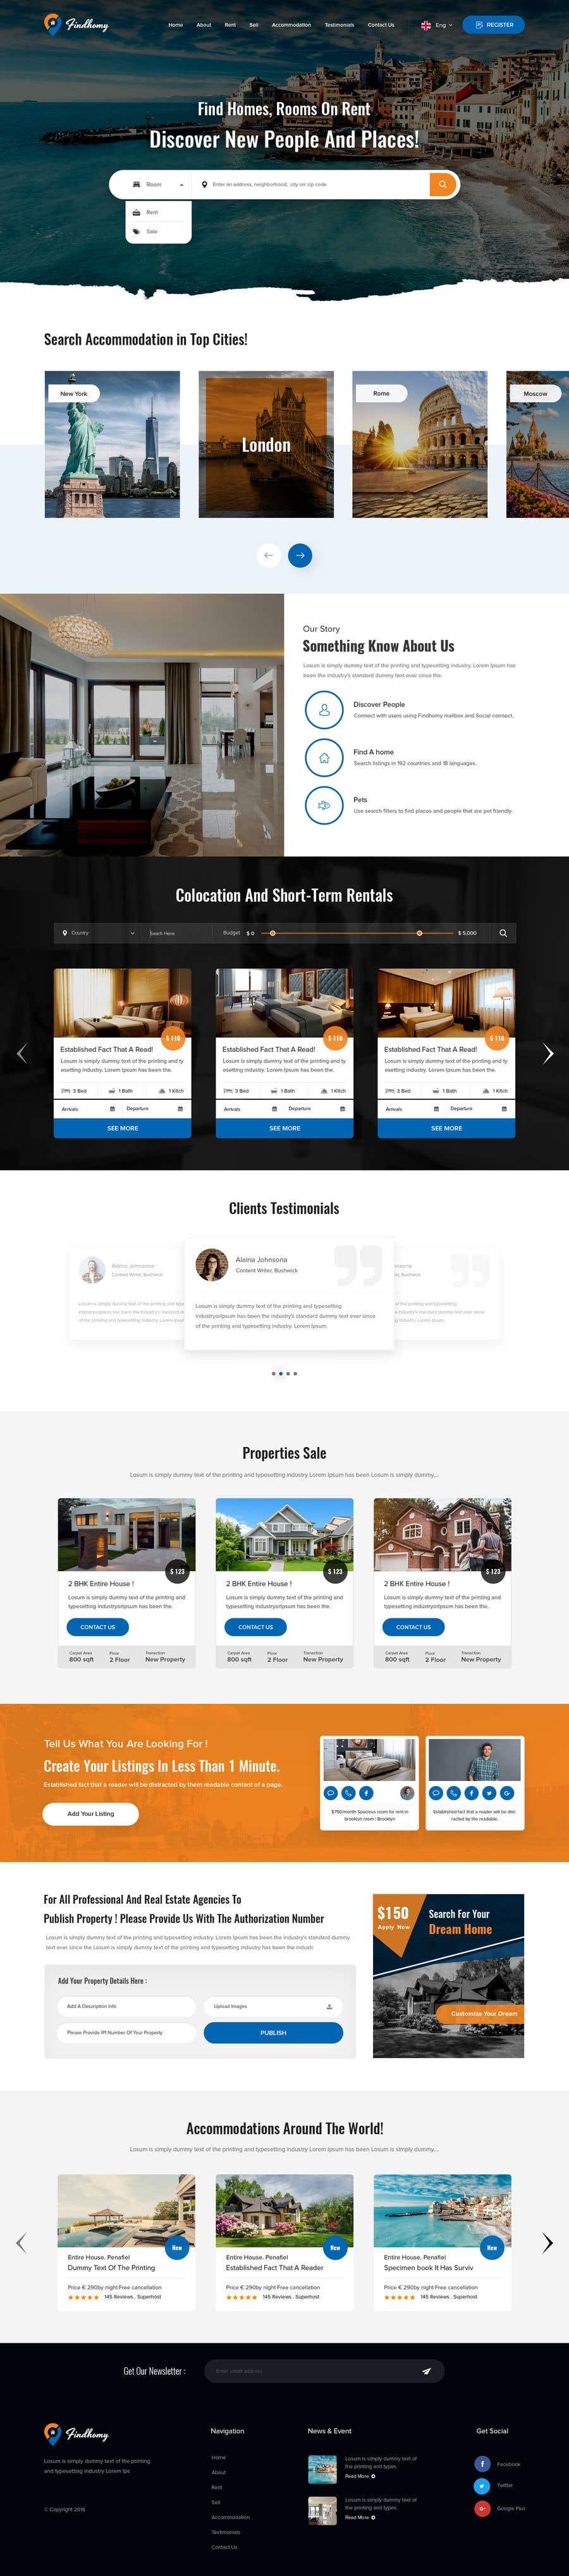 Penyertaan Peraduan #56 untuk Create a real estate site also in colocation (FINDHOMY)